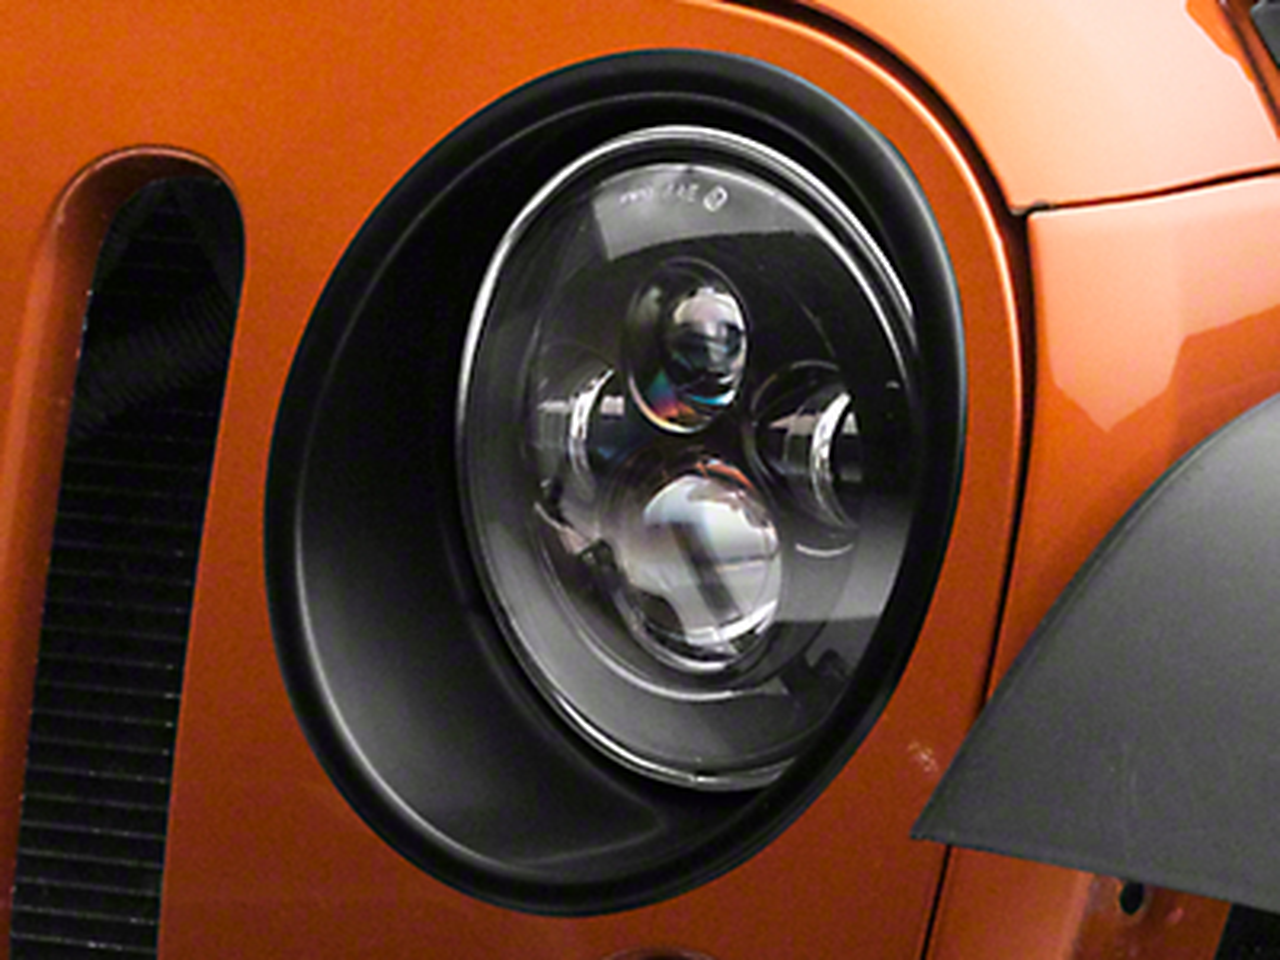 RedRock 4x4 Headlight Bezels - Matte Black (07-18 Wrangler JK)